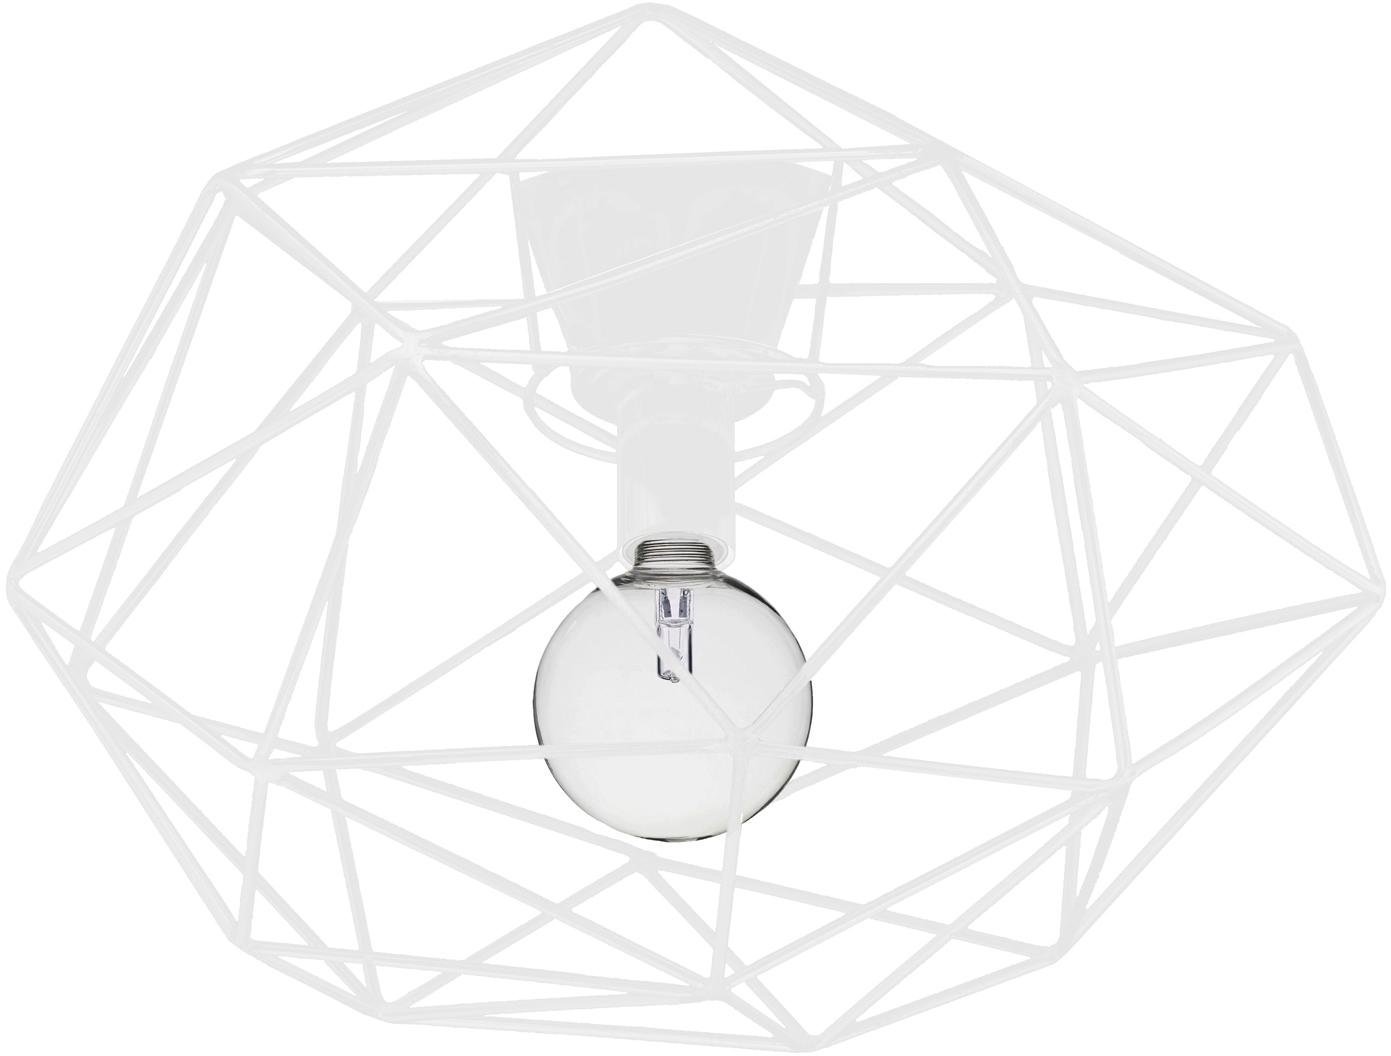 Deckenleuchte Diamond in Weiss, Messing, lackiert, Weiss, Ø 50 x H 32 cm